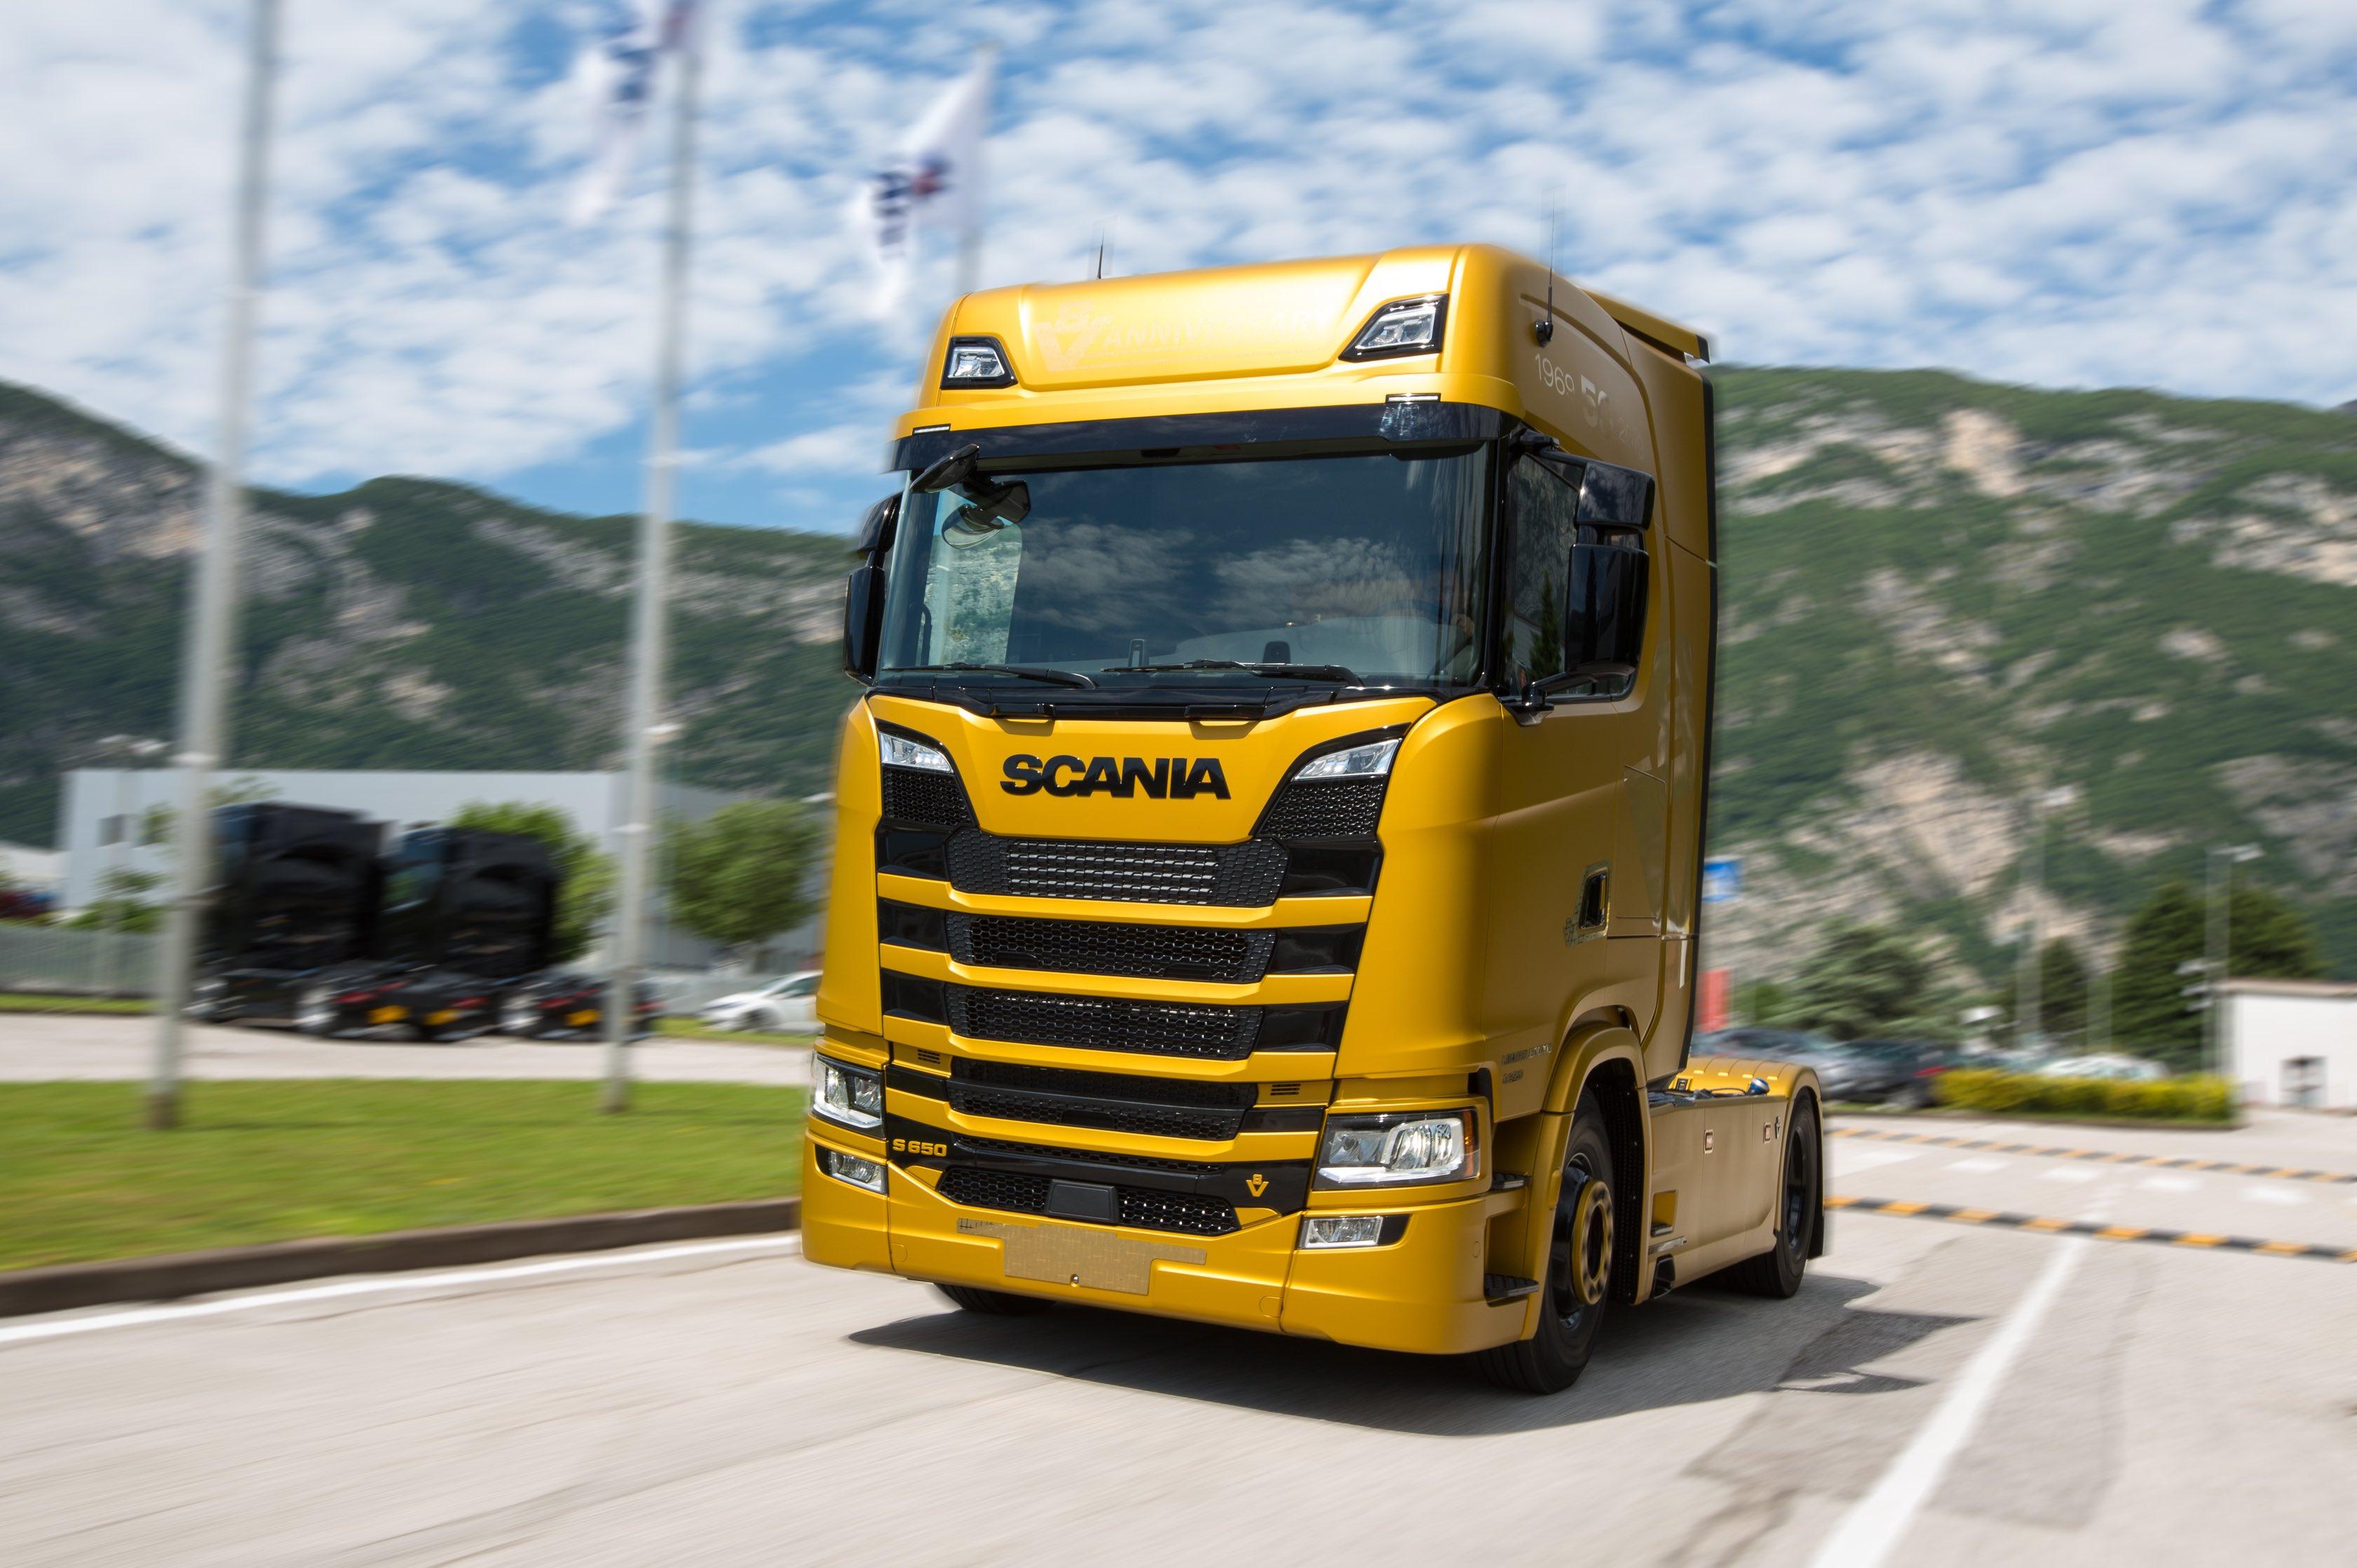 Special edition: Scania V8 Anniversary